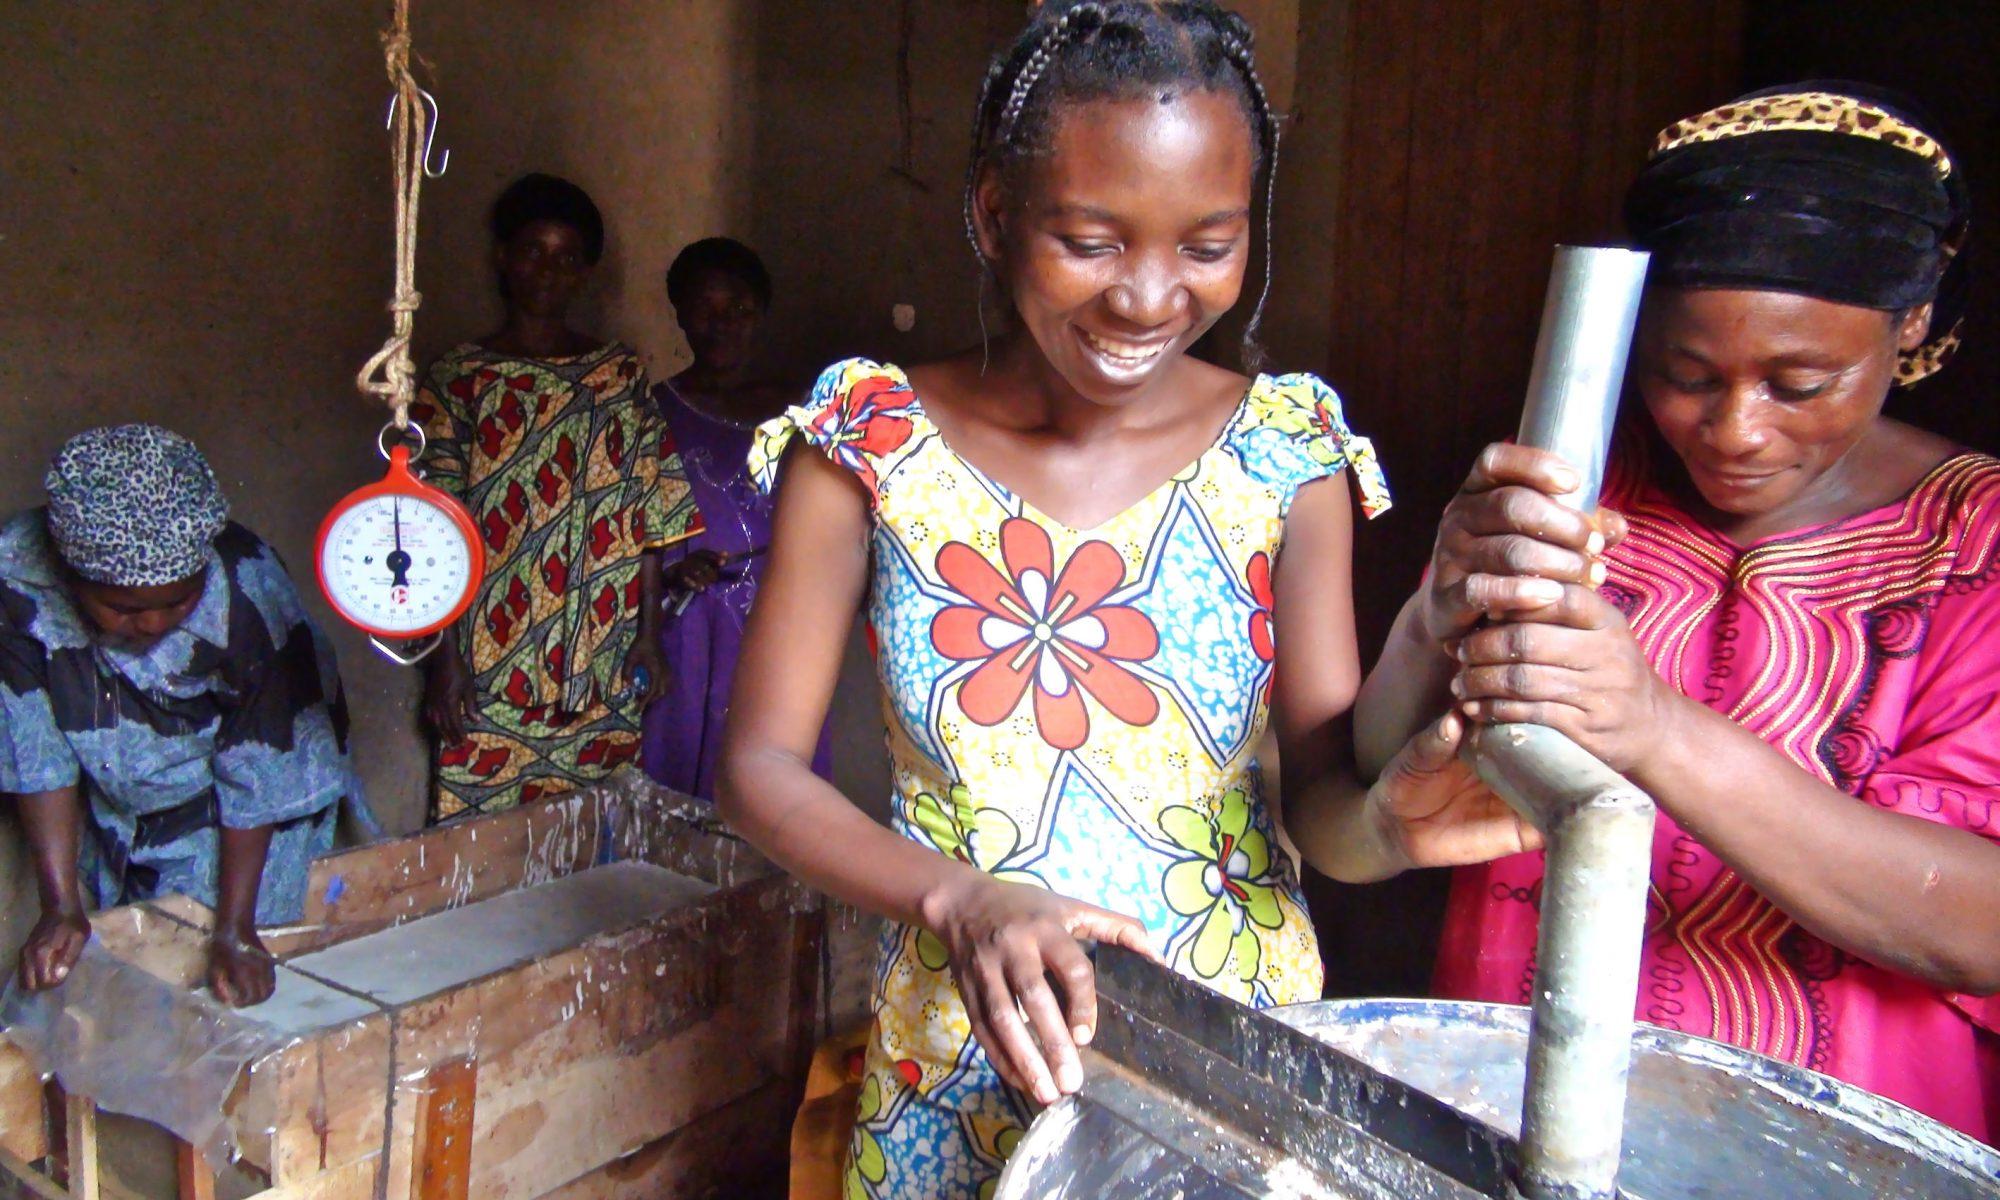 Mujeres emprendedoras RDC_UNDP_CC BY SA 20